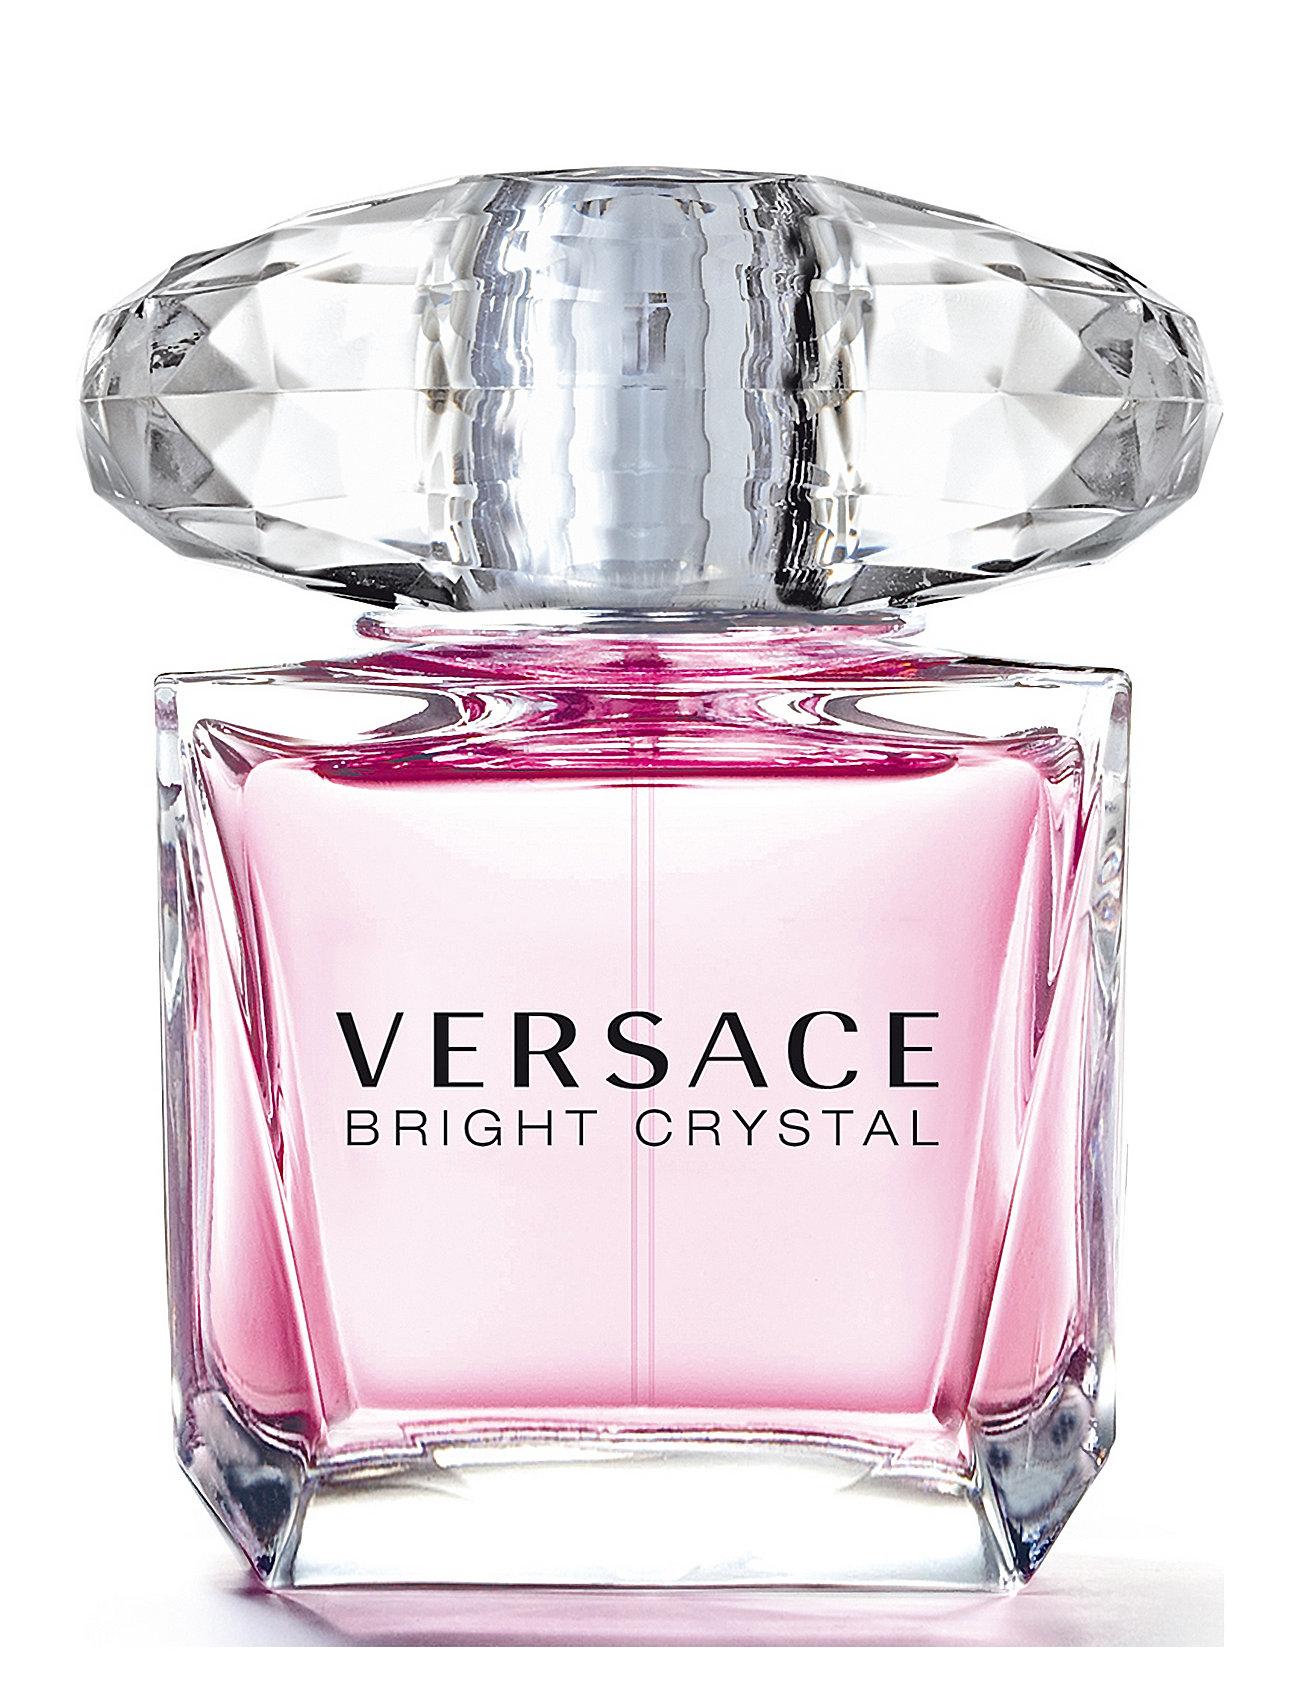 versace fragrance – Versace bright crystal eau de toile på boozt.com dk